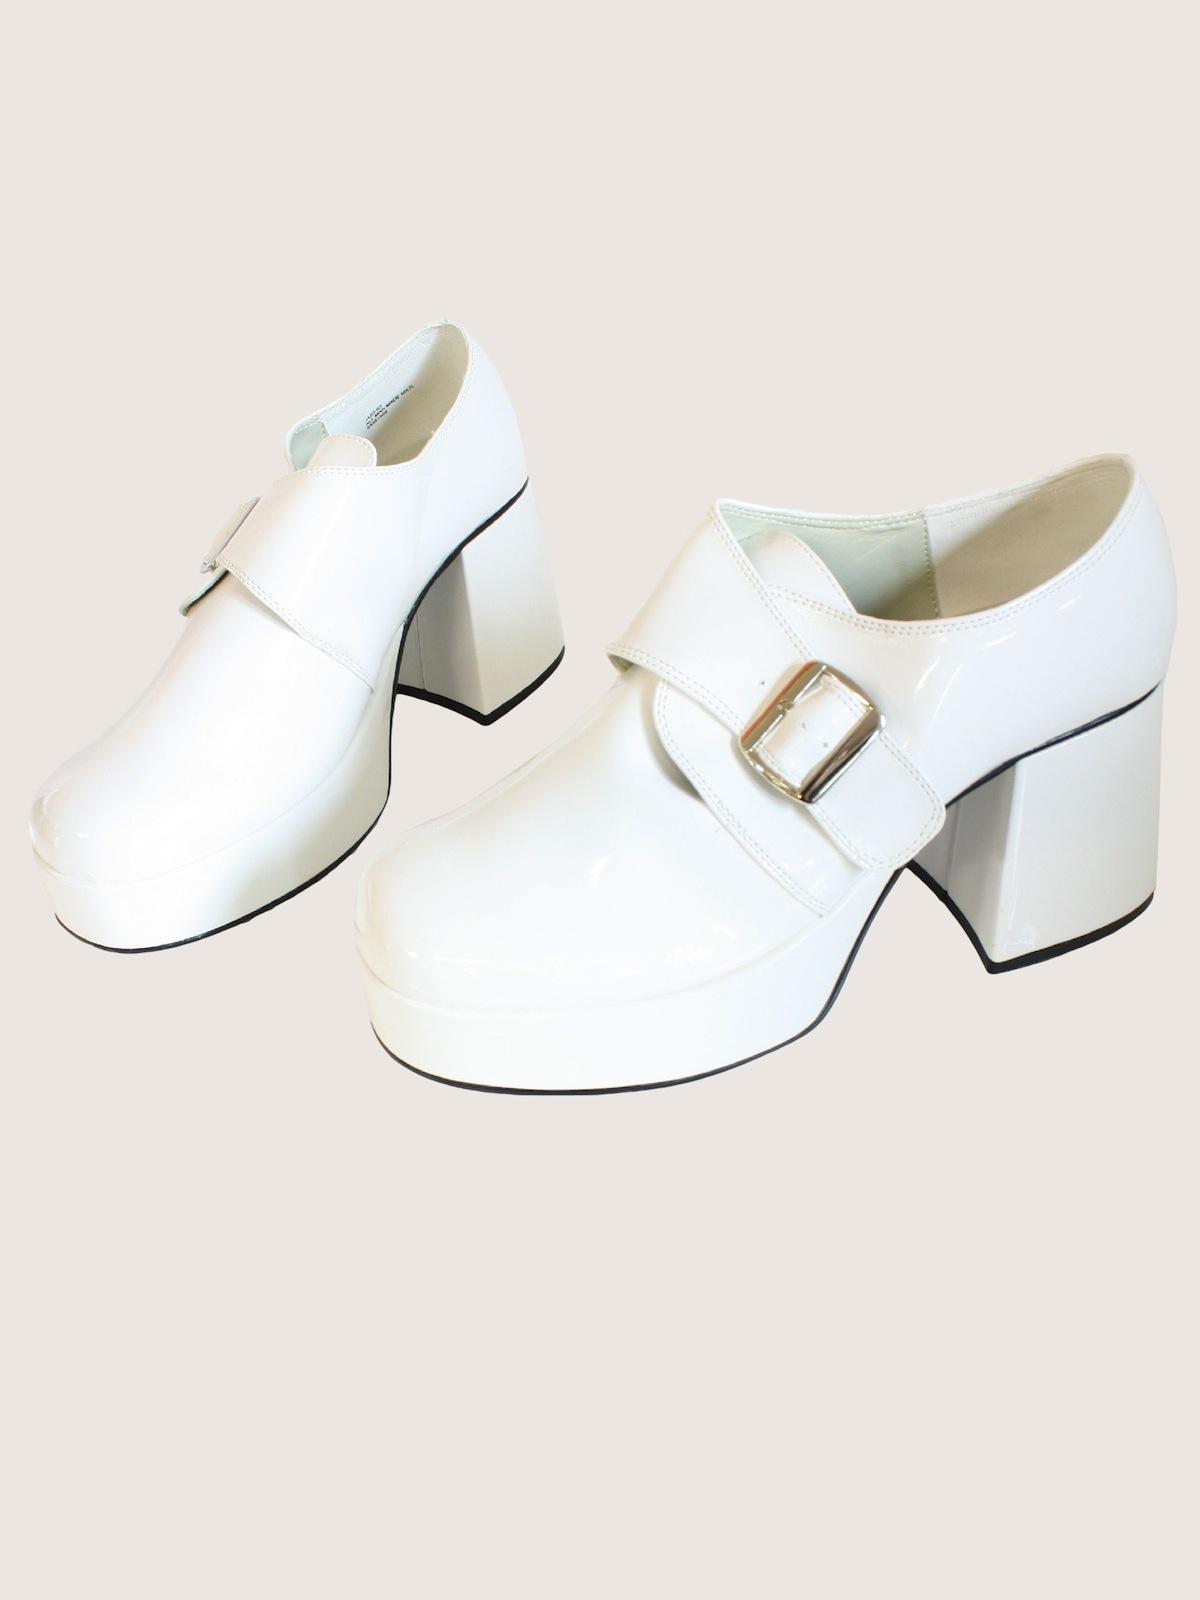 9f4bdee3212f 70s Shoes (White Platform Shoes)  70s reproduction -White Platform ...